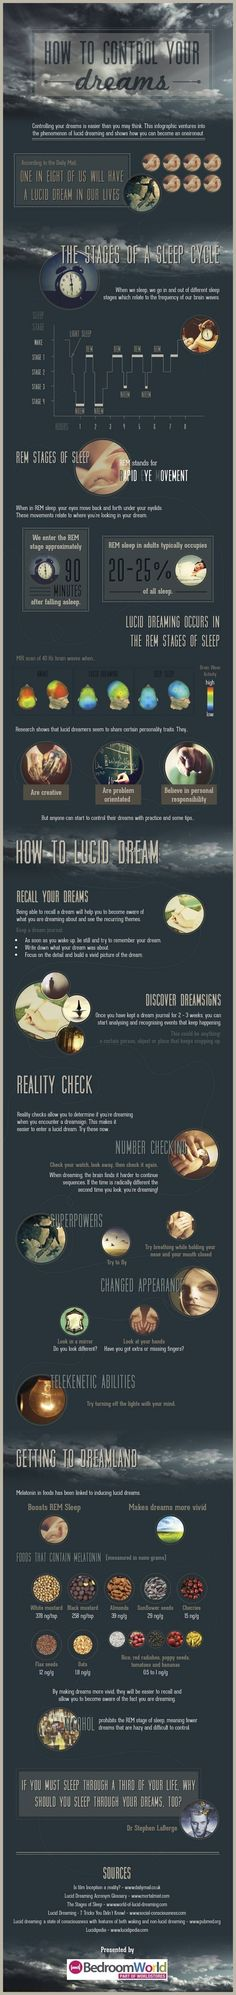 How to: Lucid Dream - Imgur